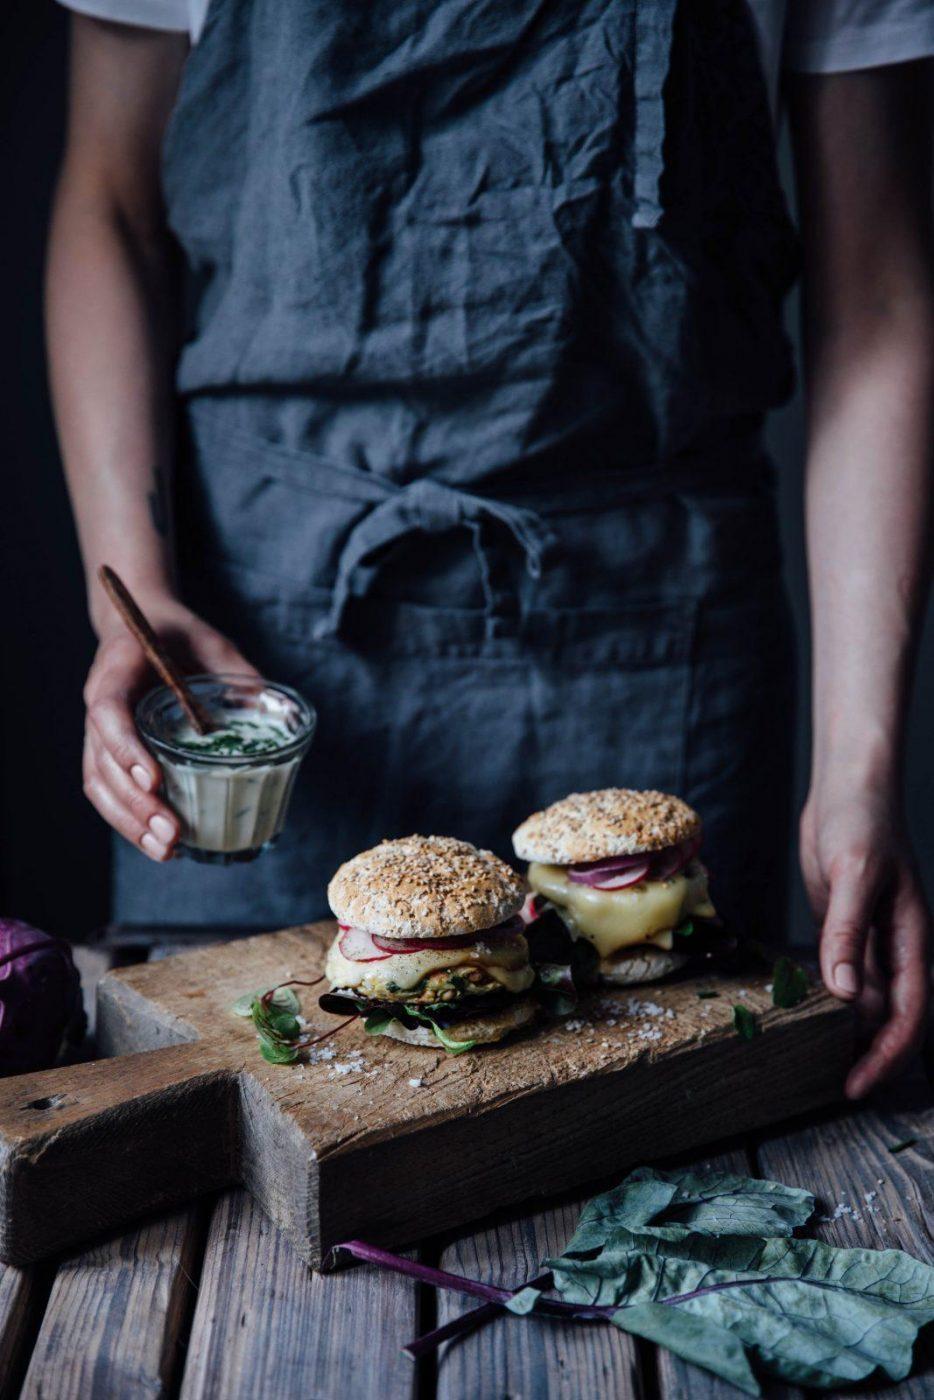 Image for Gluten-free & Vegetarian Kohlrabi-Cheese Burgers